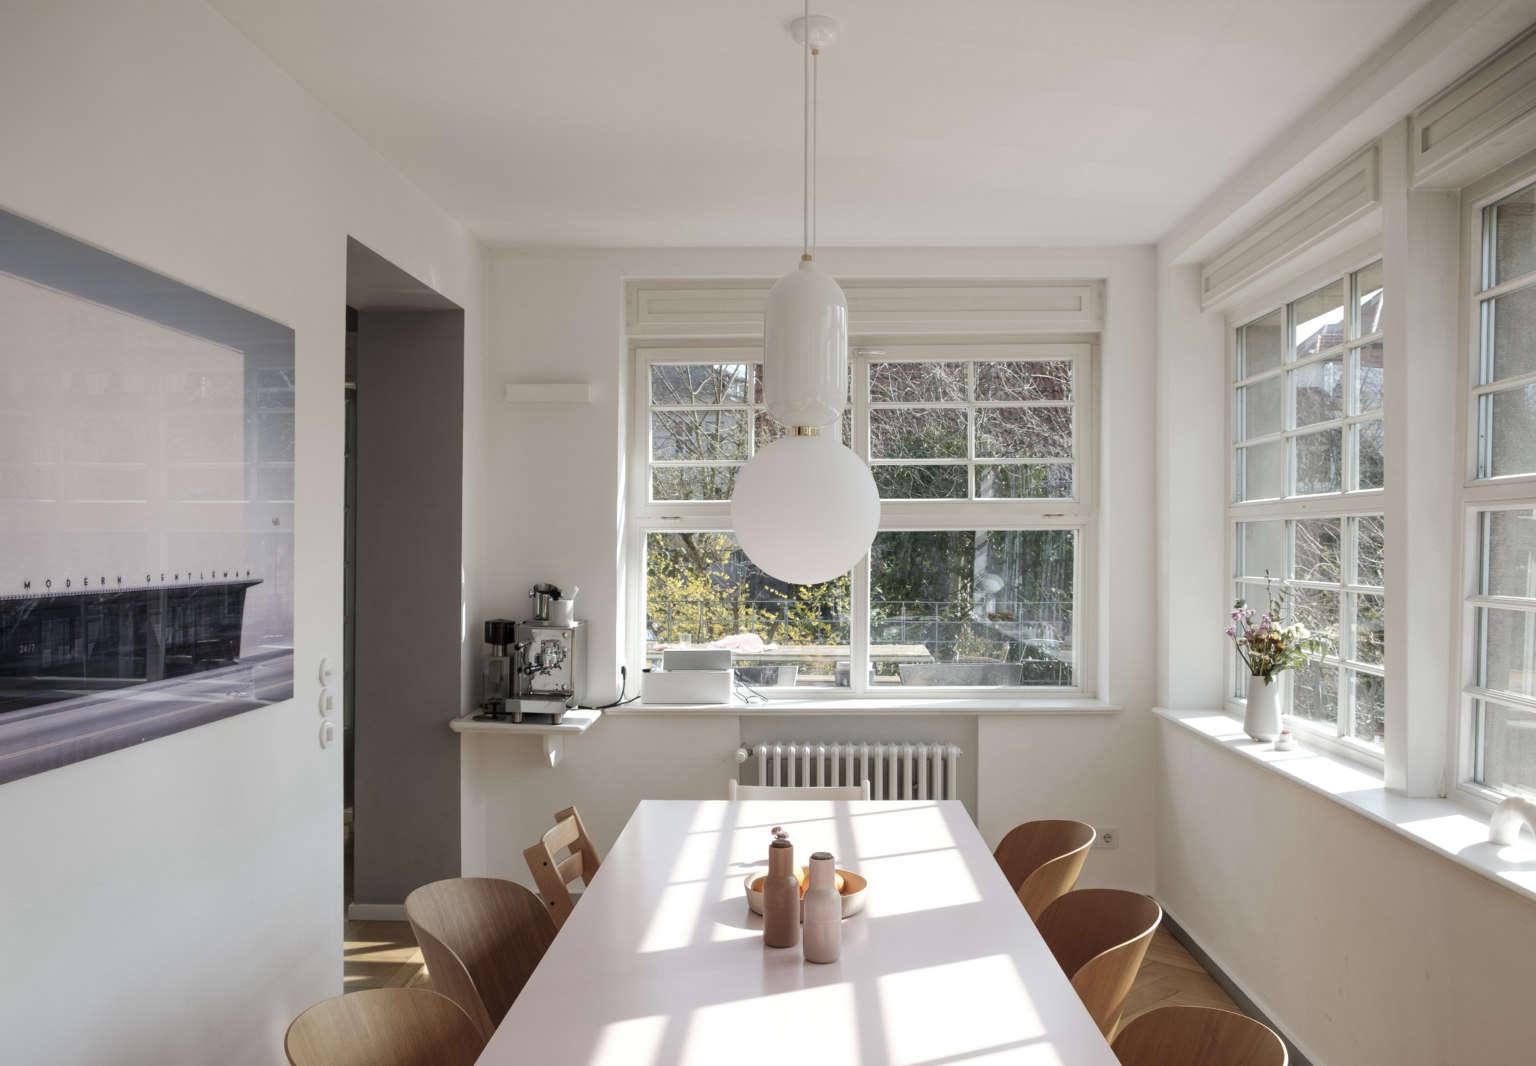 dining room studio oink leipzig villa 9 1536x1066